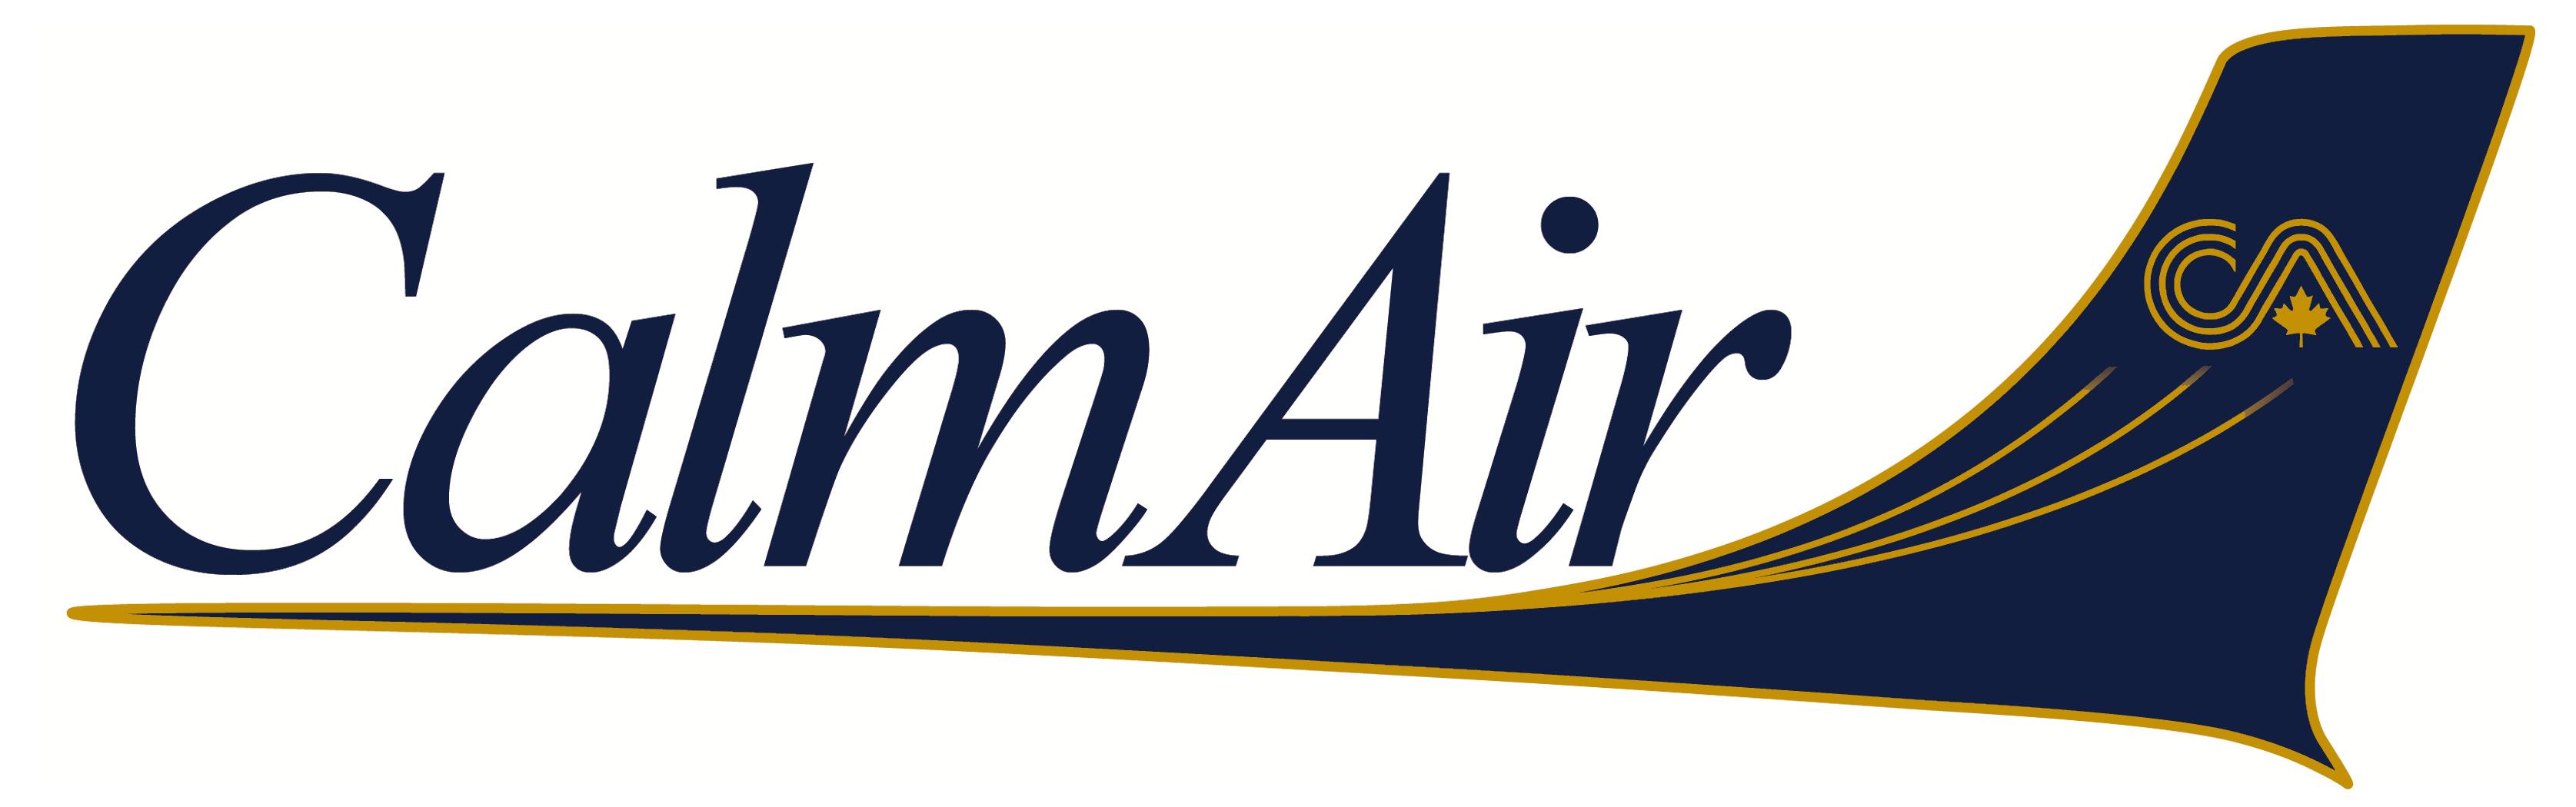 Calm Air Logos Download